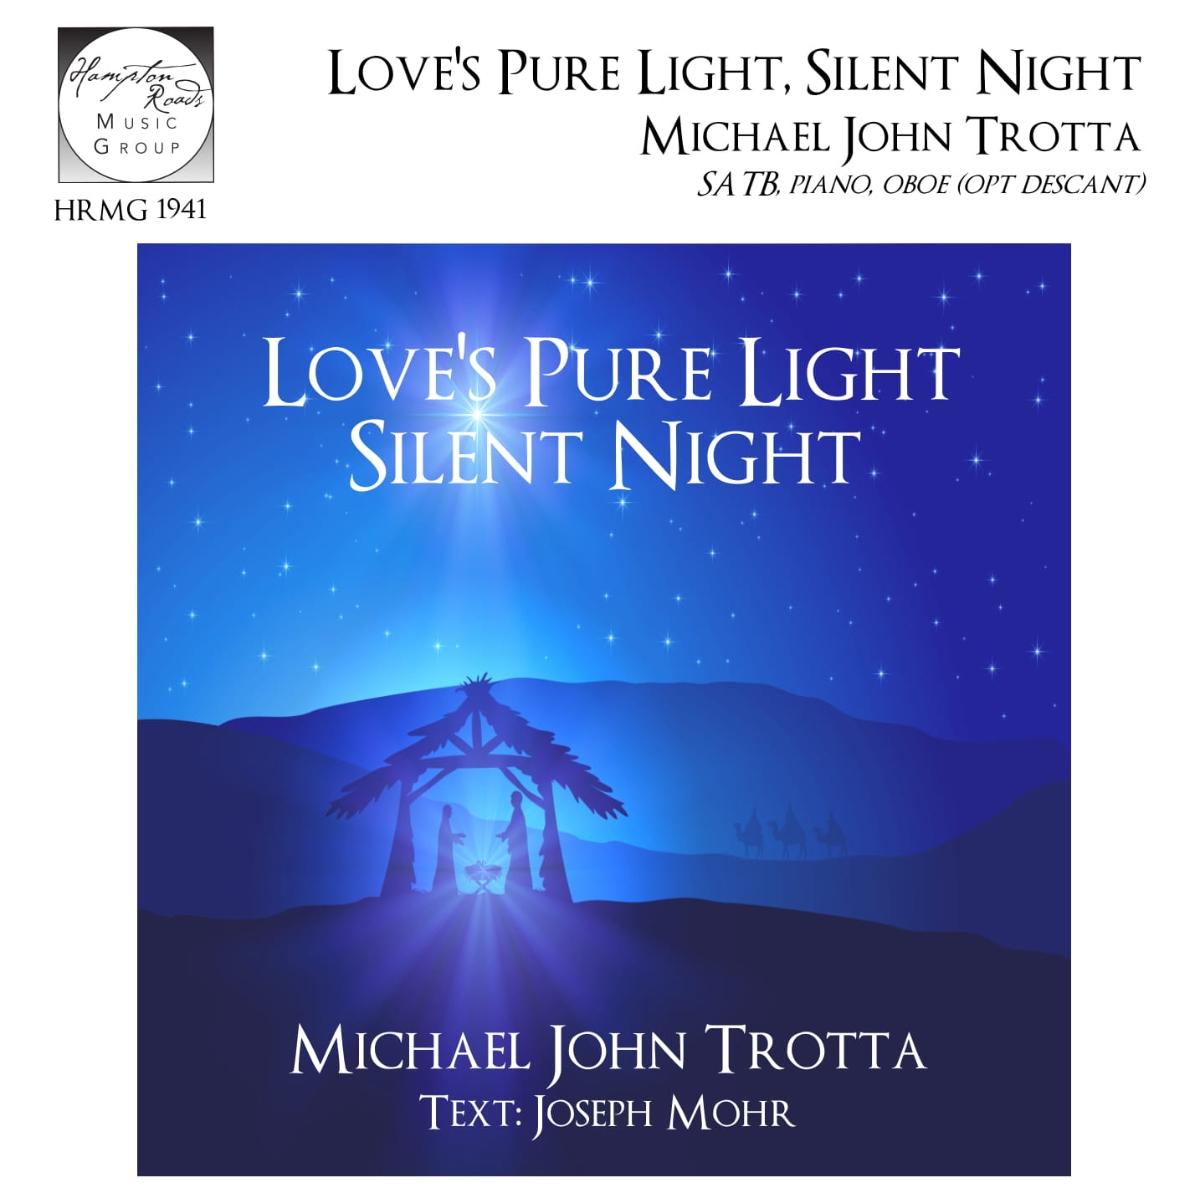 Love's Pure Light Silent Night - Michael John Trotta